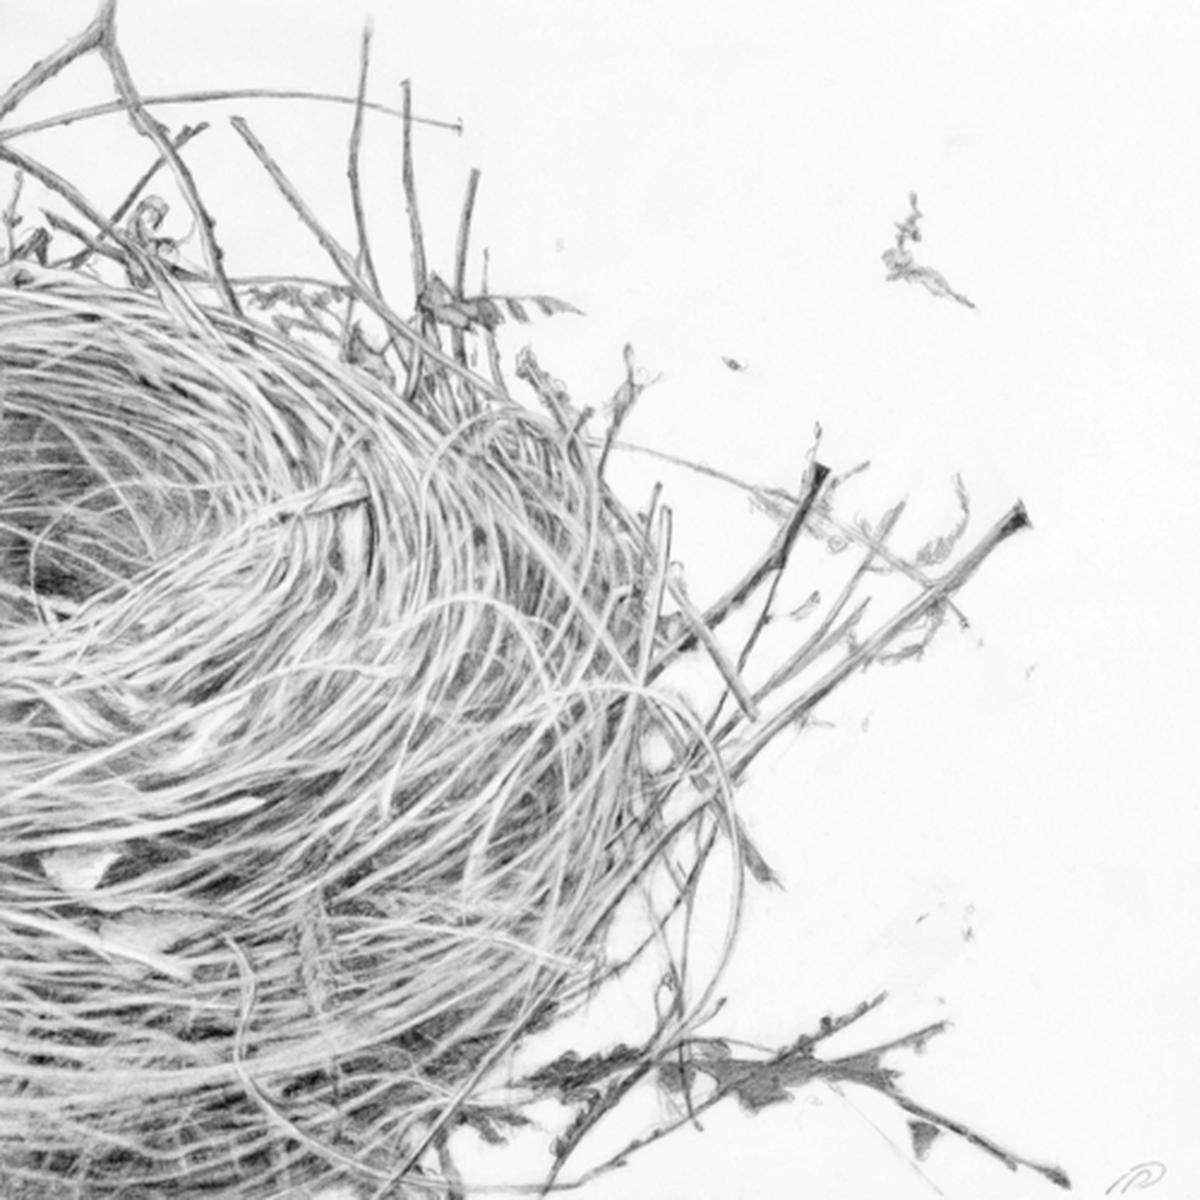 Empty Nest #1 (large view)